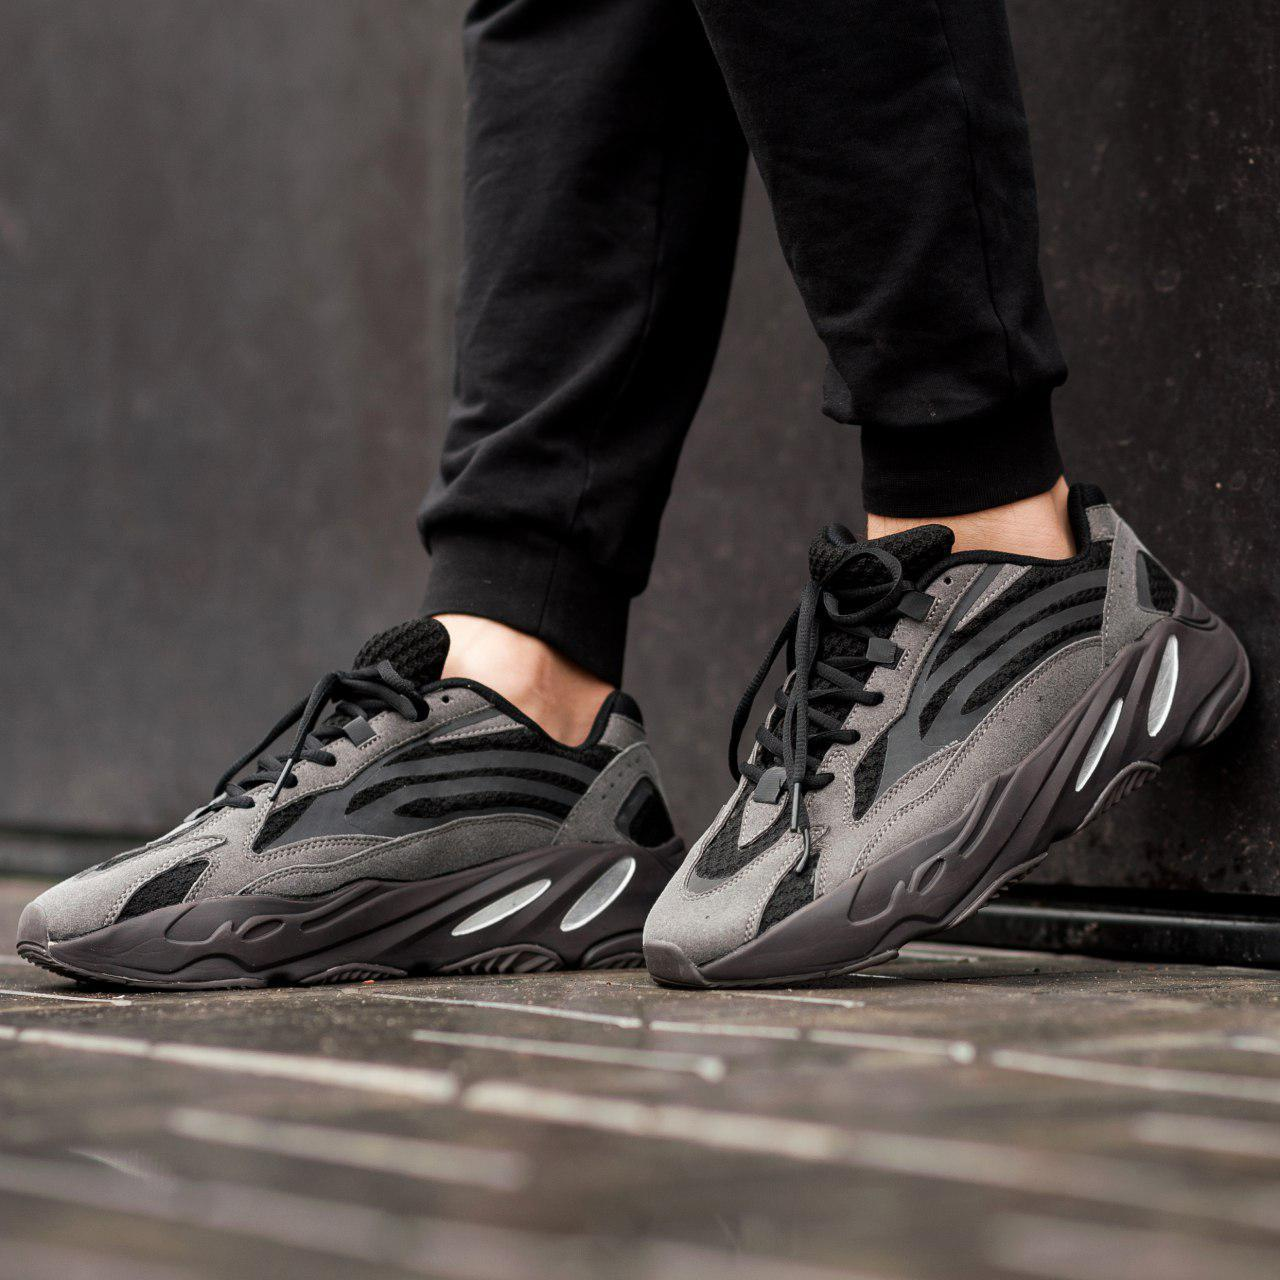 Мужские кроссовки Adidas Yeezy Boost 700 V2 Black (Реплика ААА+)